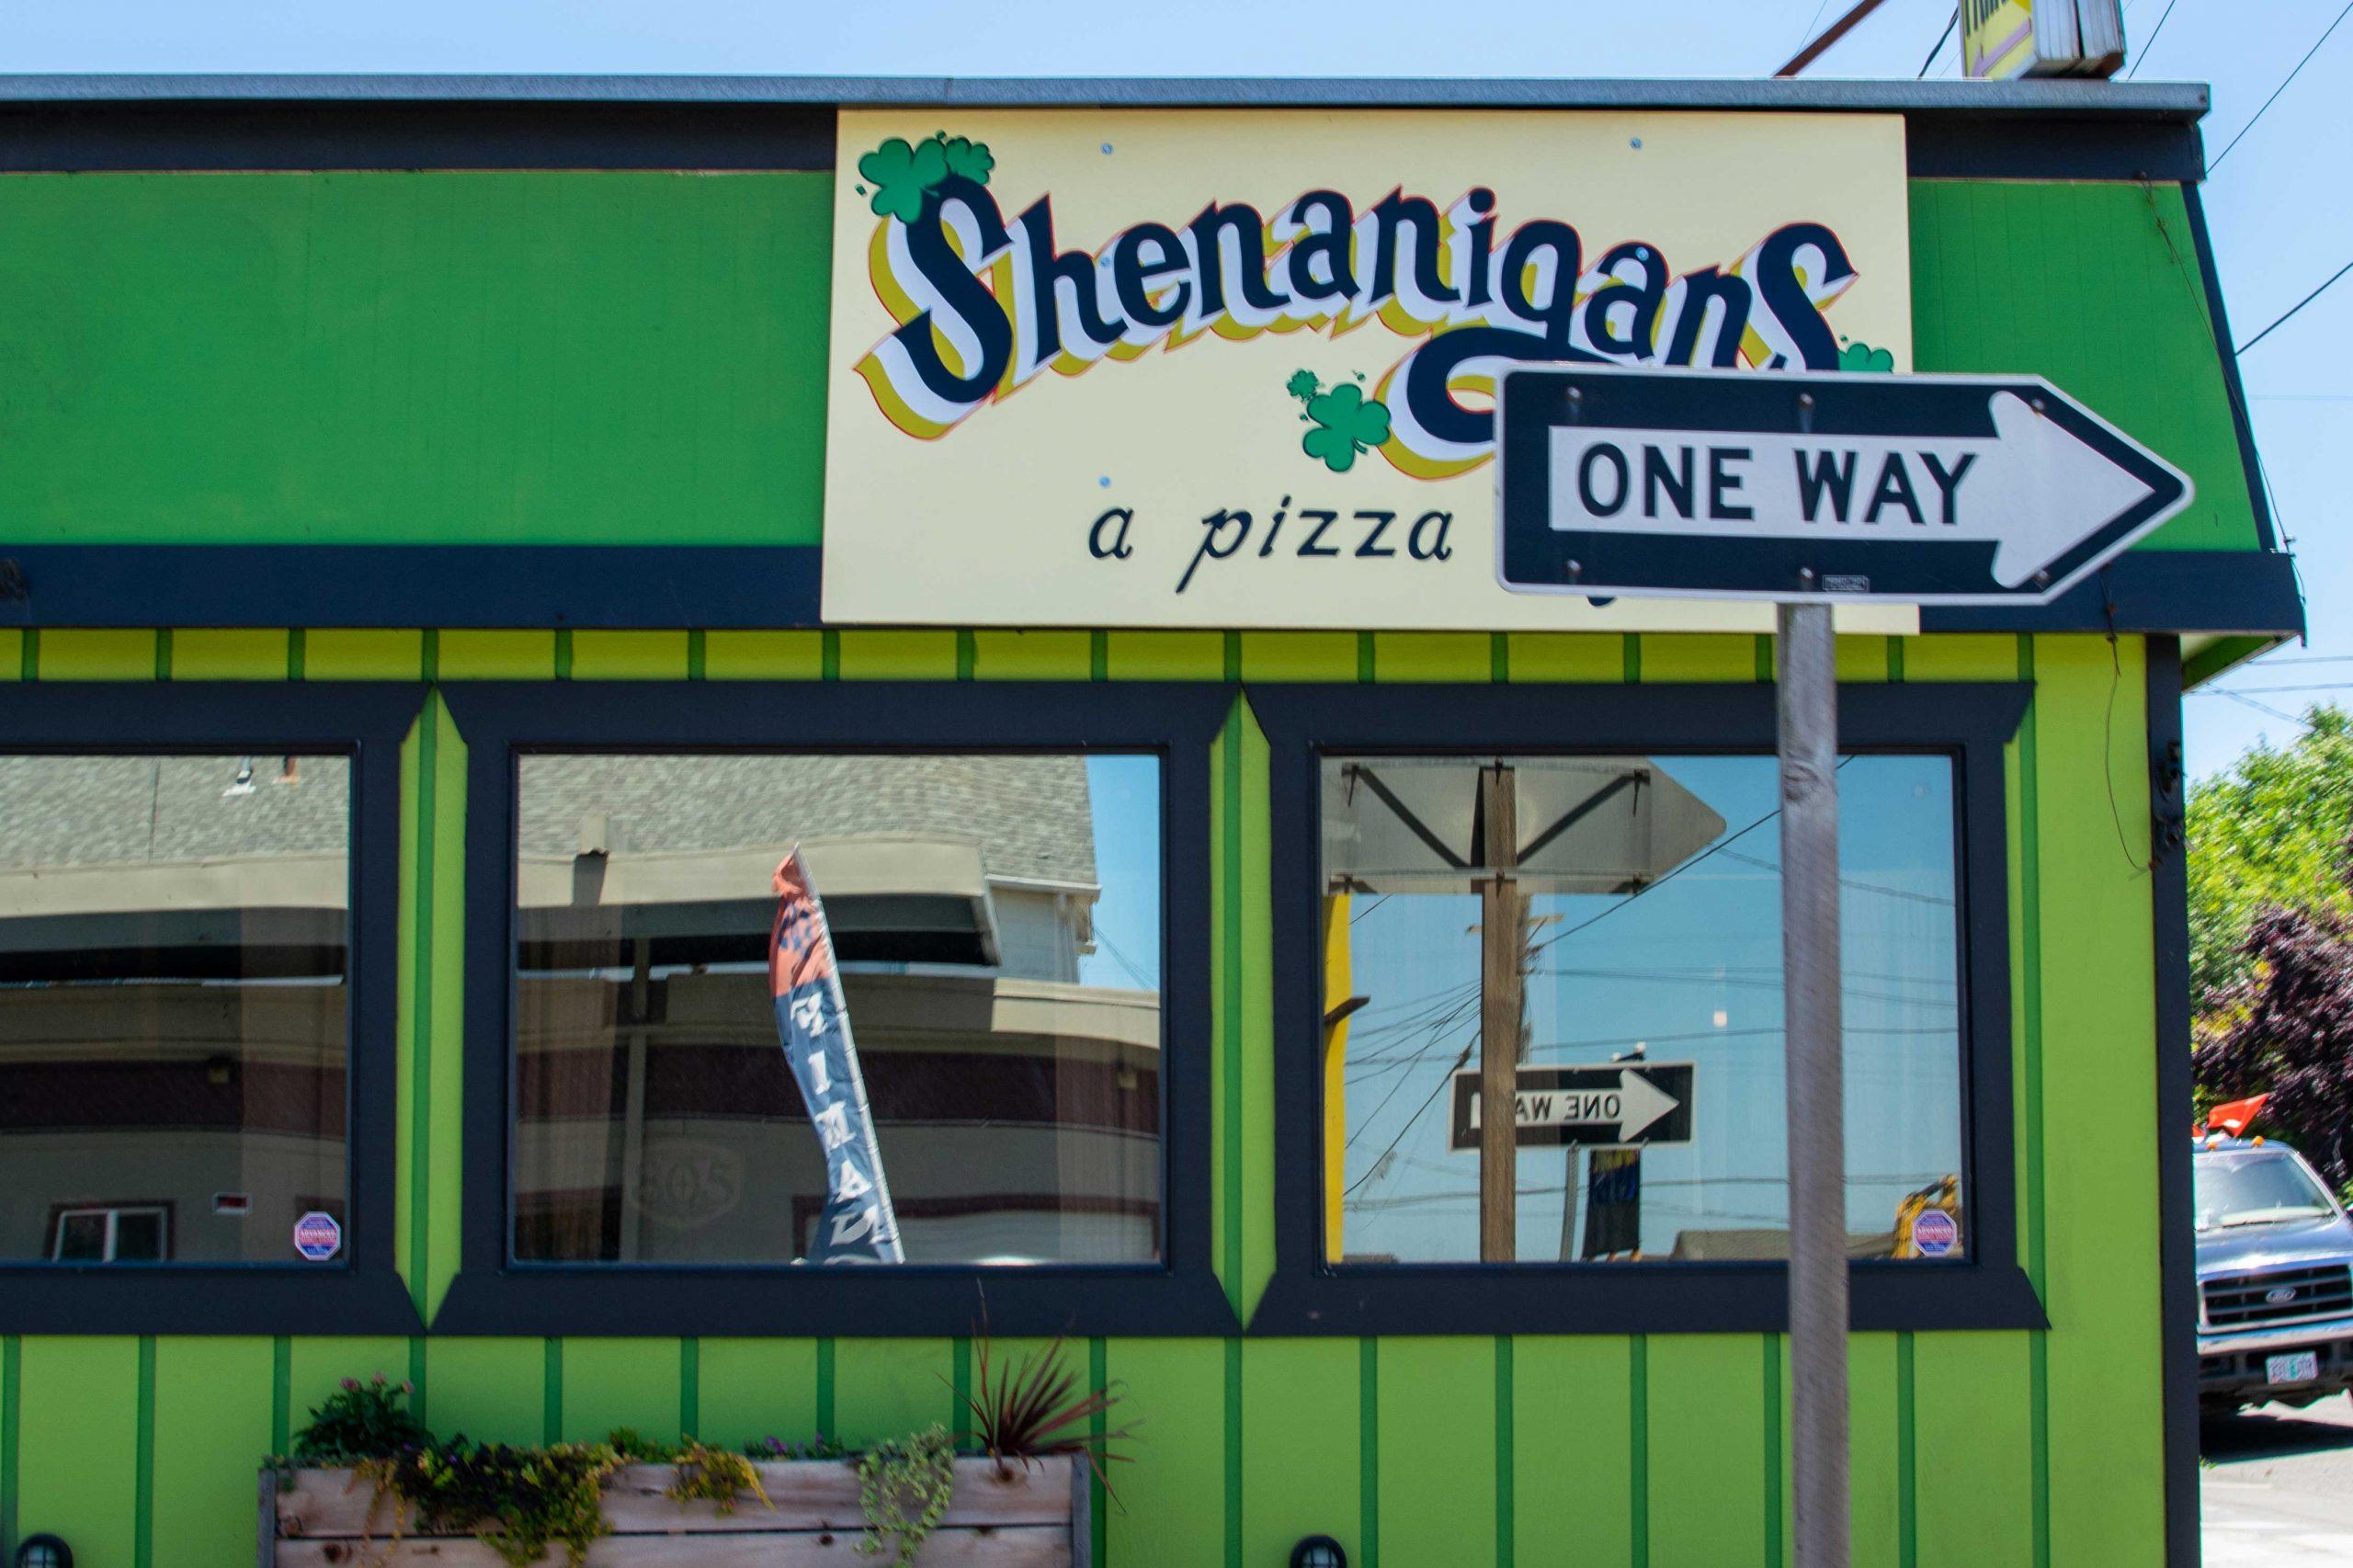 Shenanigan's